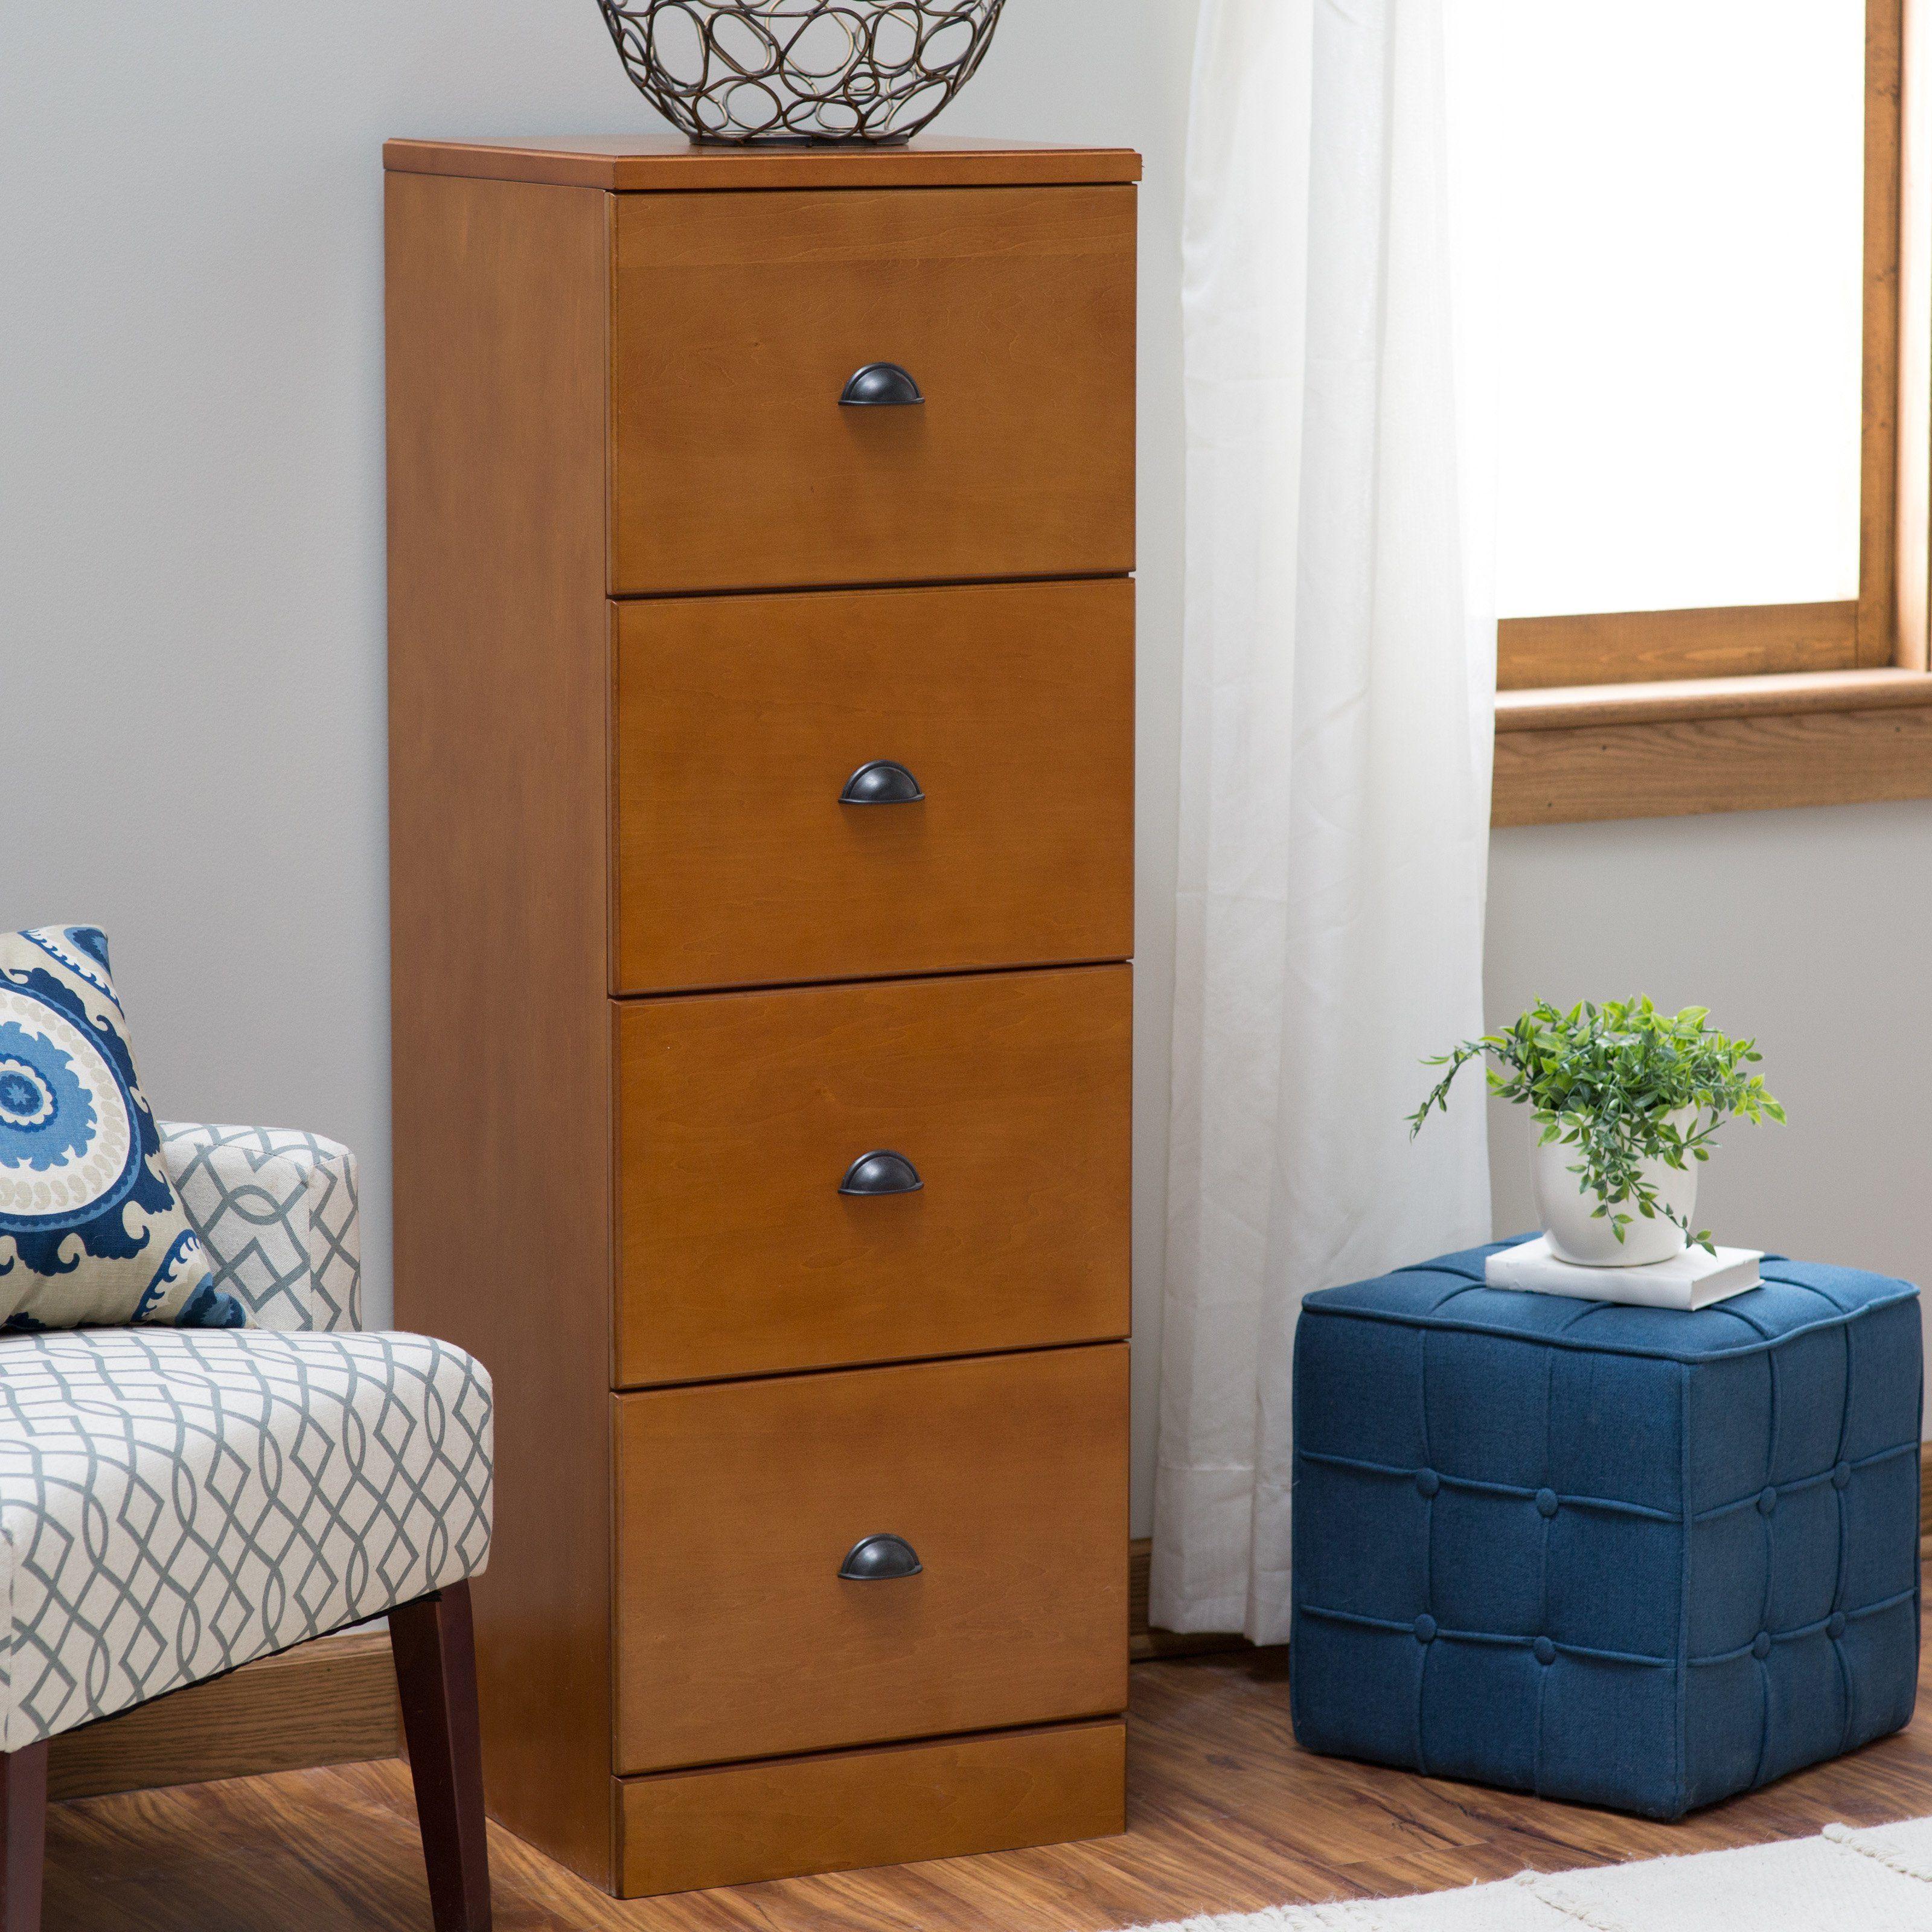 Belham Living Cambridge 4-Drawer Wood File Cabinet